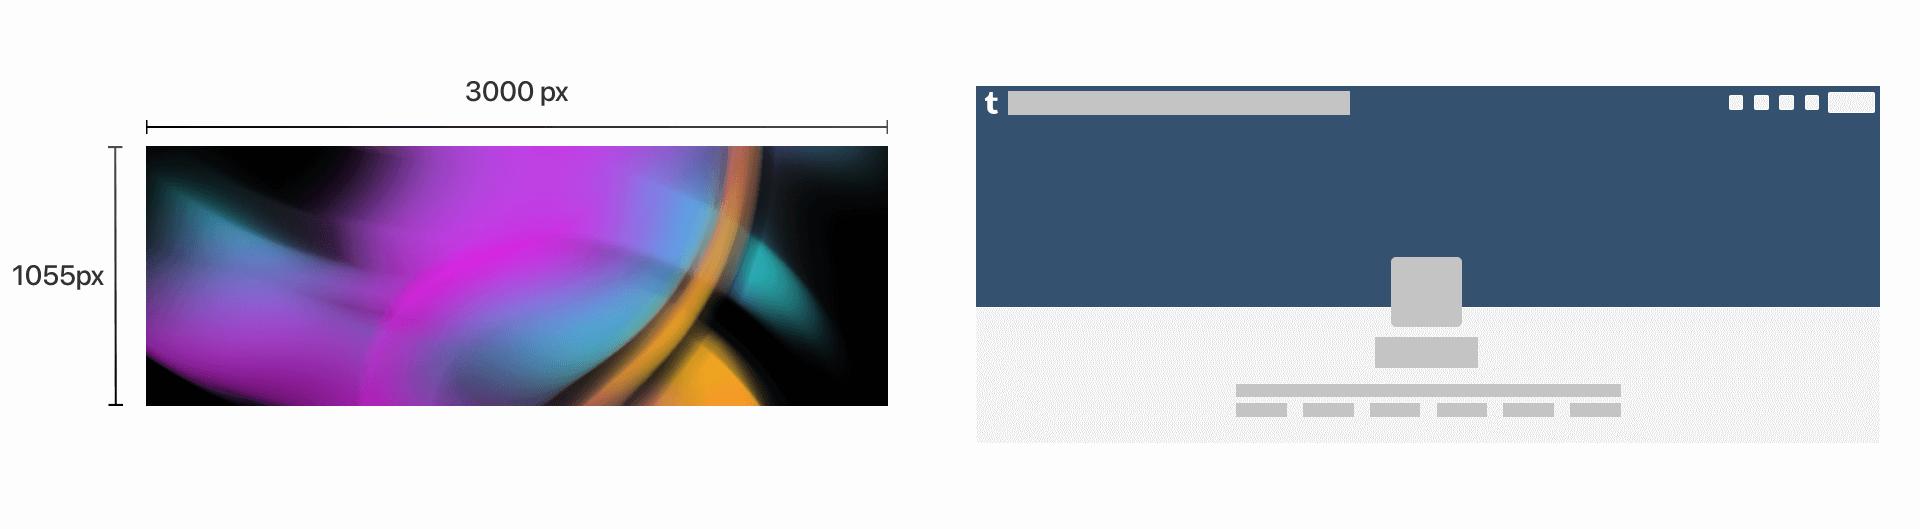 tumblr header size